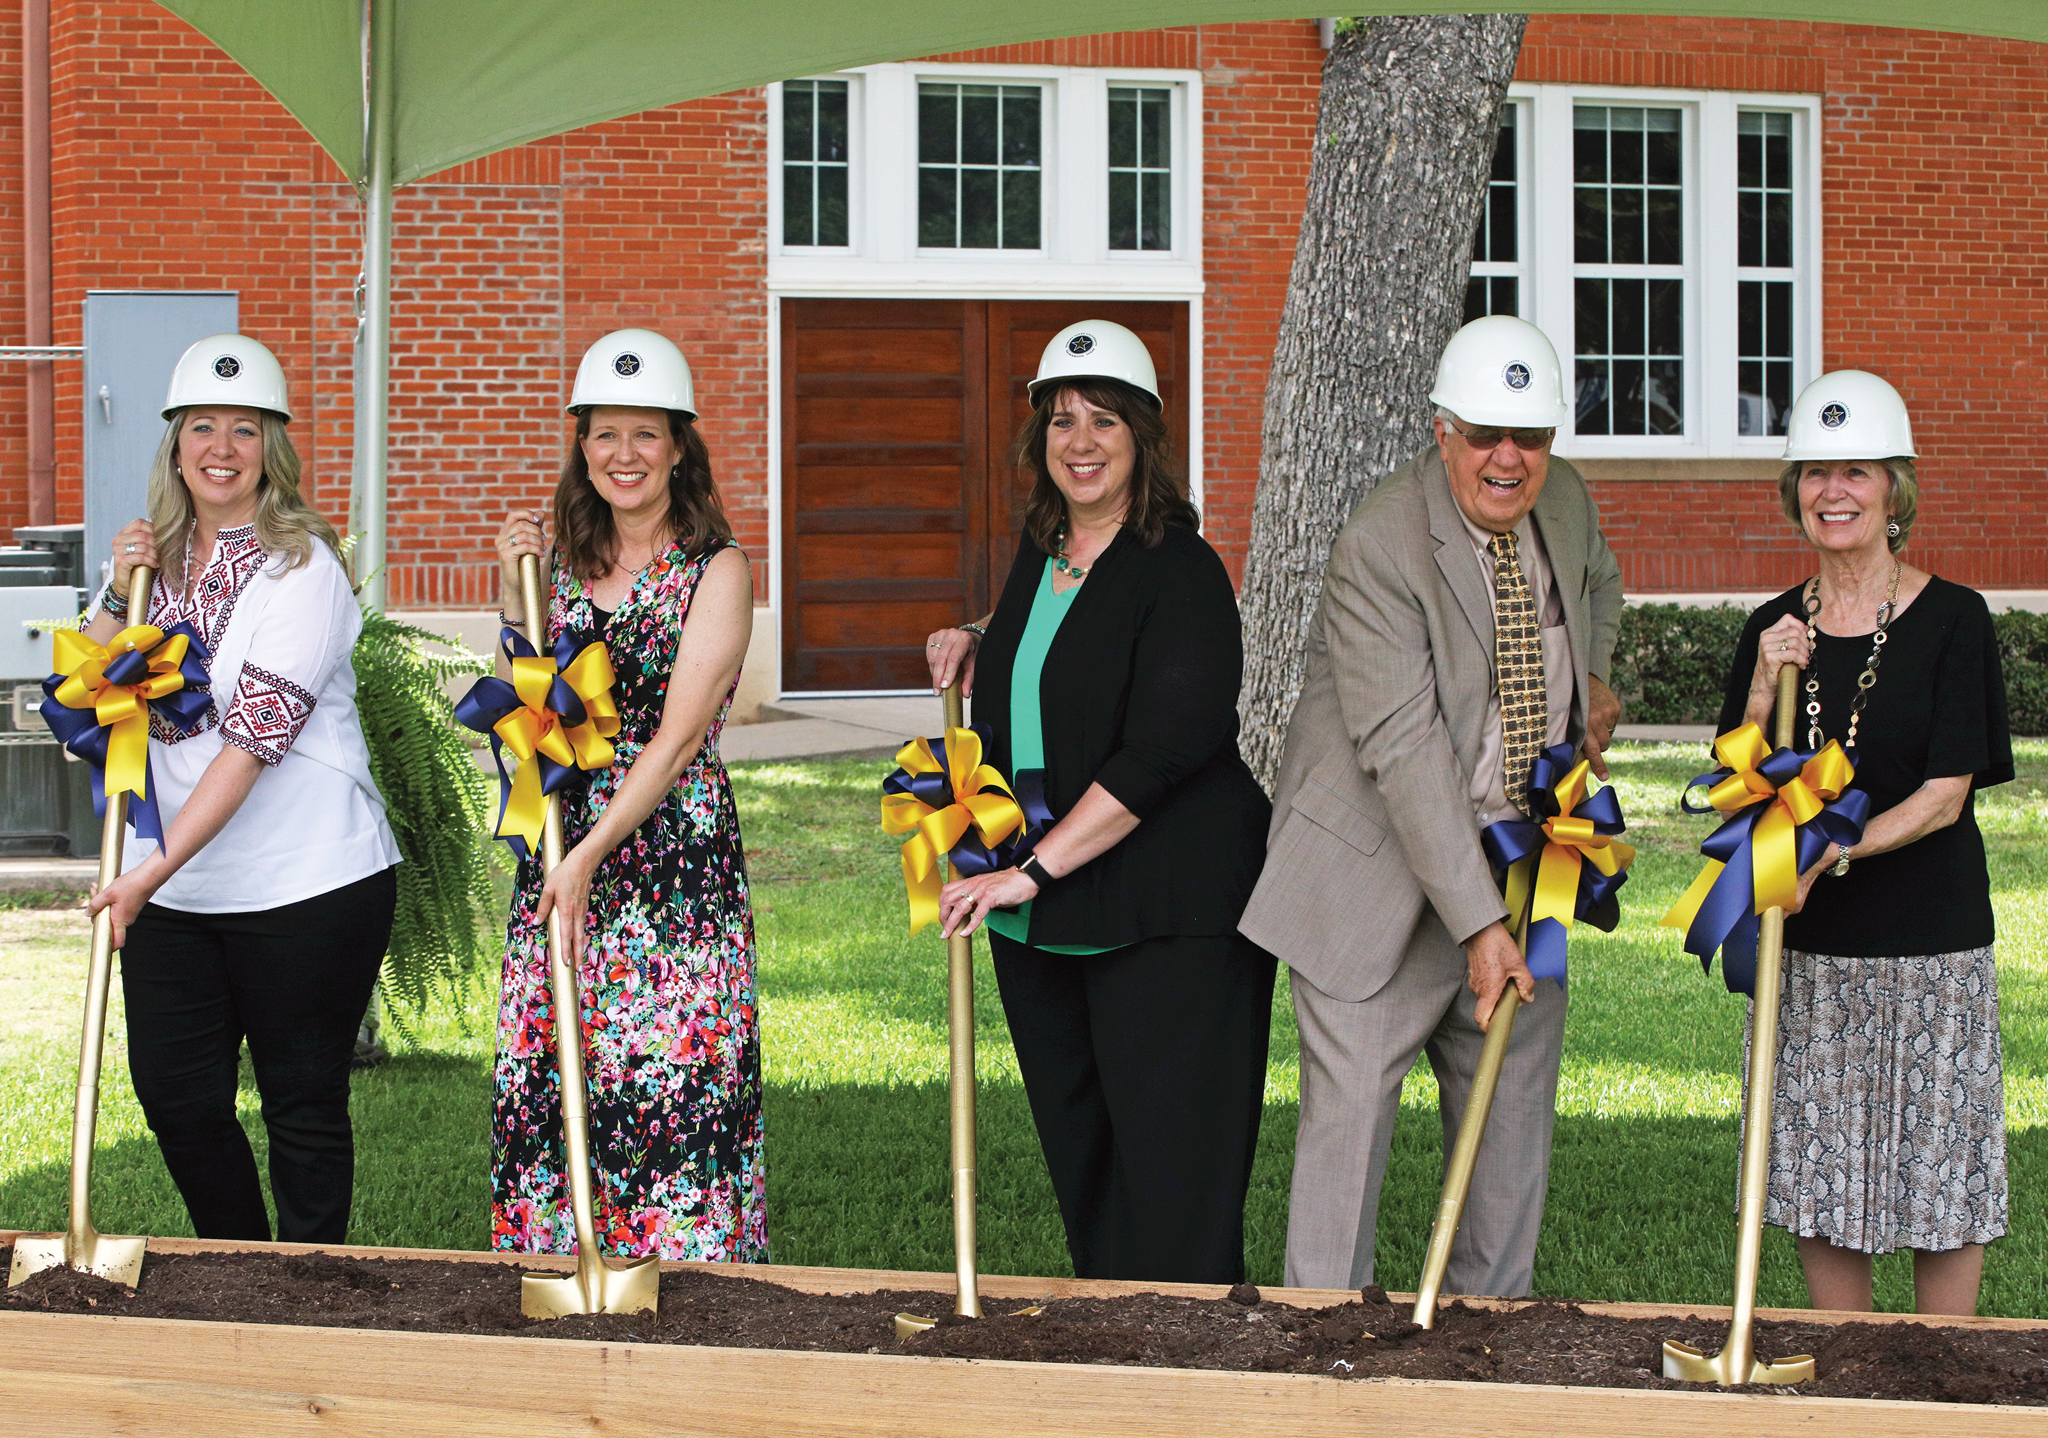 HPU breaks ground for Newbury Family Welcome Center (2020)<br>HPU establishes new visual identity (2021)